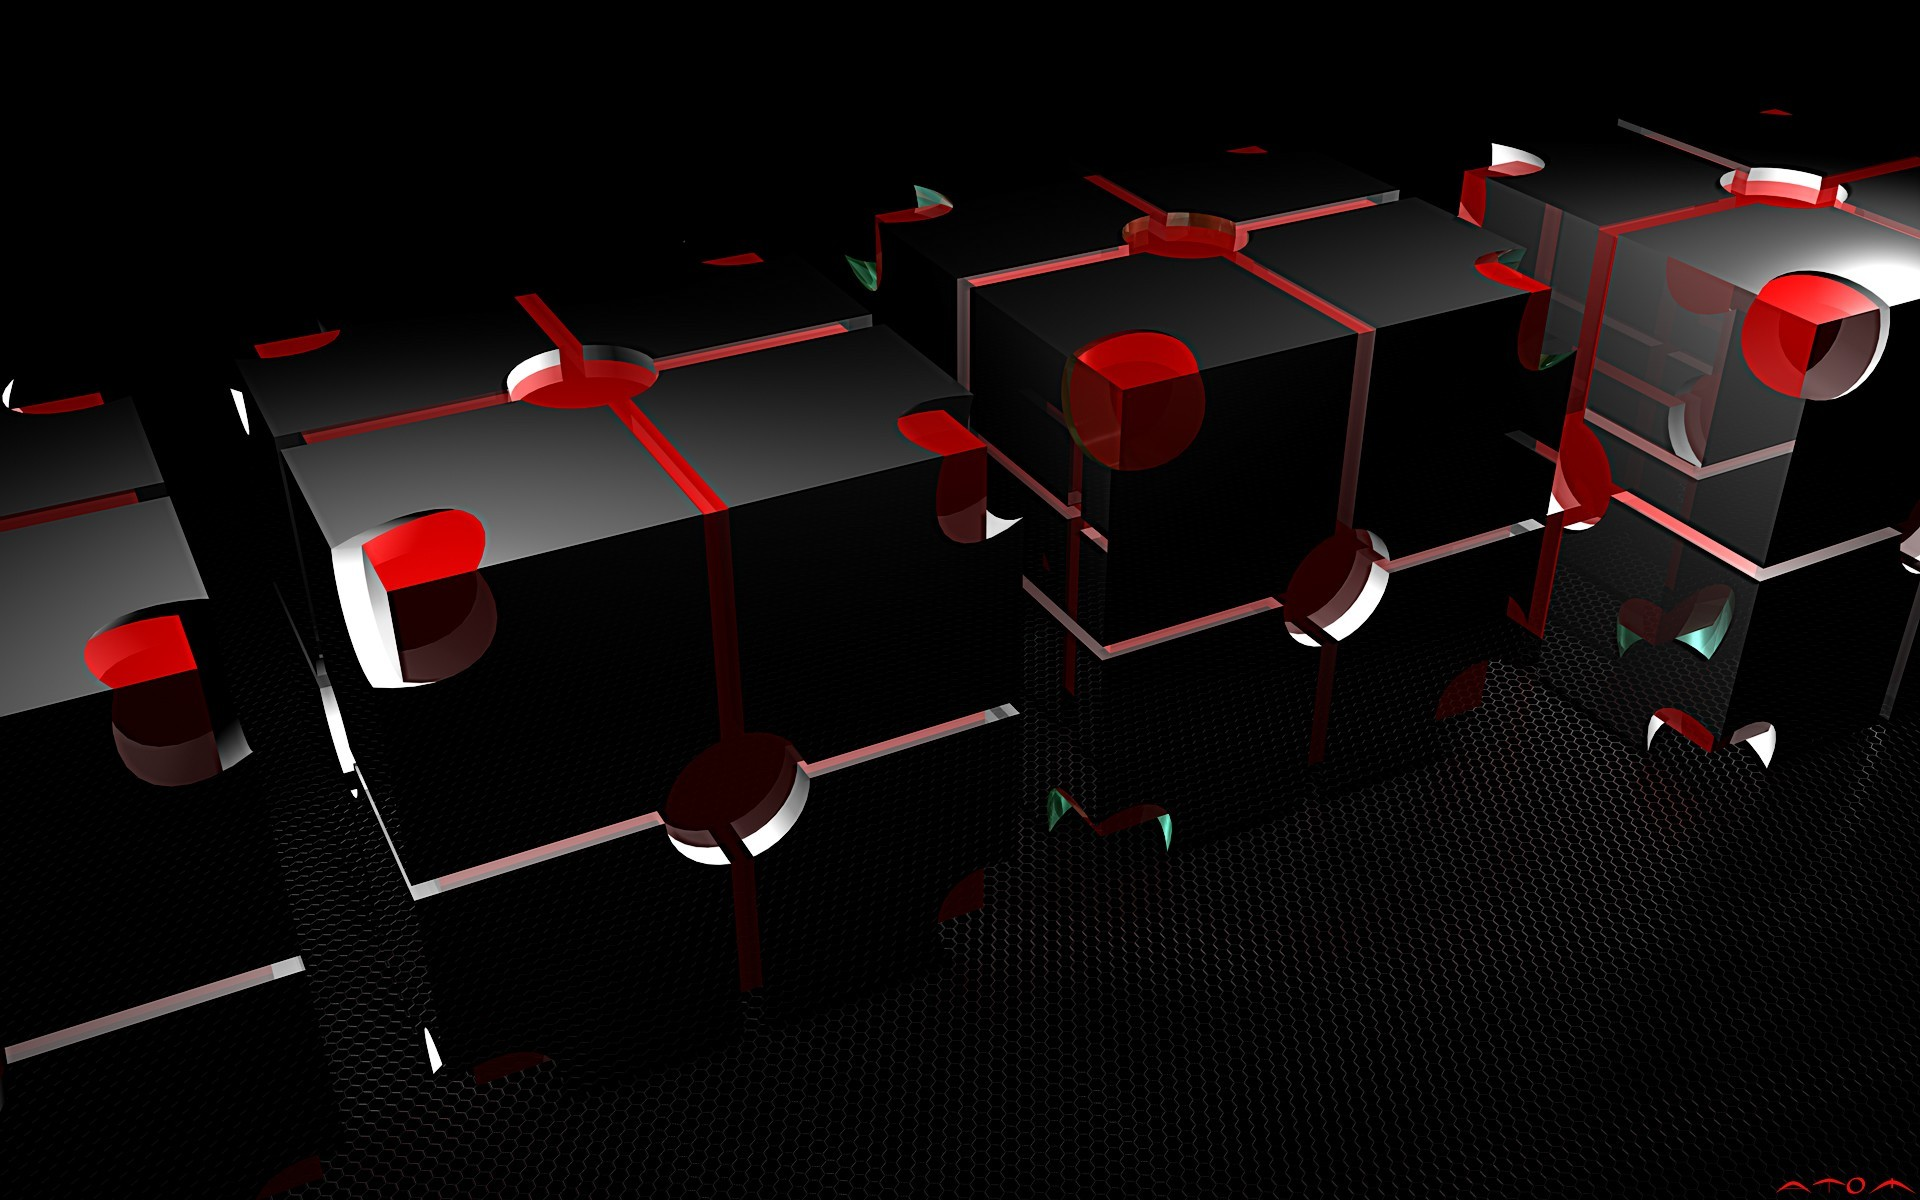 Res: 1920x1200, HD Wallpaper Abstract Black Red Box Glossy Hd